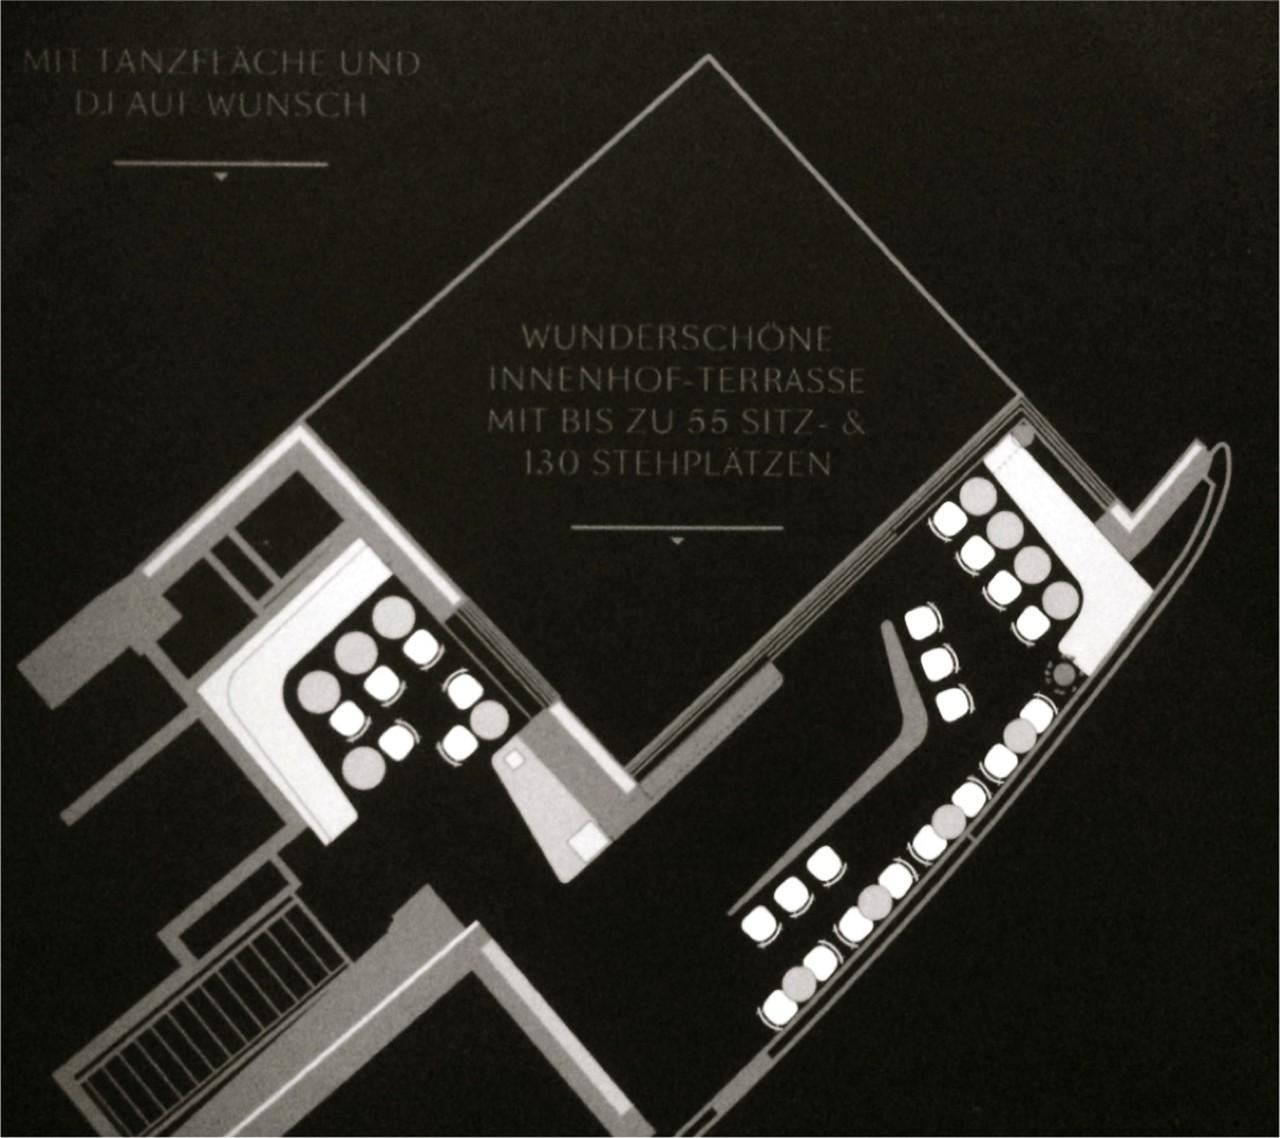 Ismaning PR & Marketing Event Bar/Nachtclub/Lounge Cole & Porter image 10